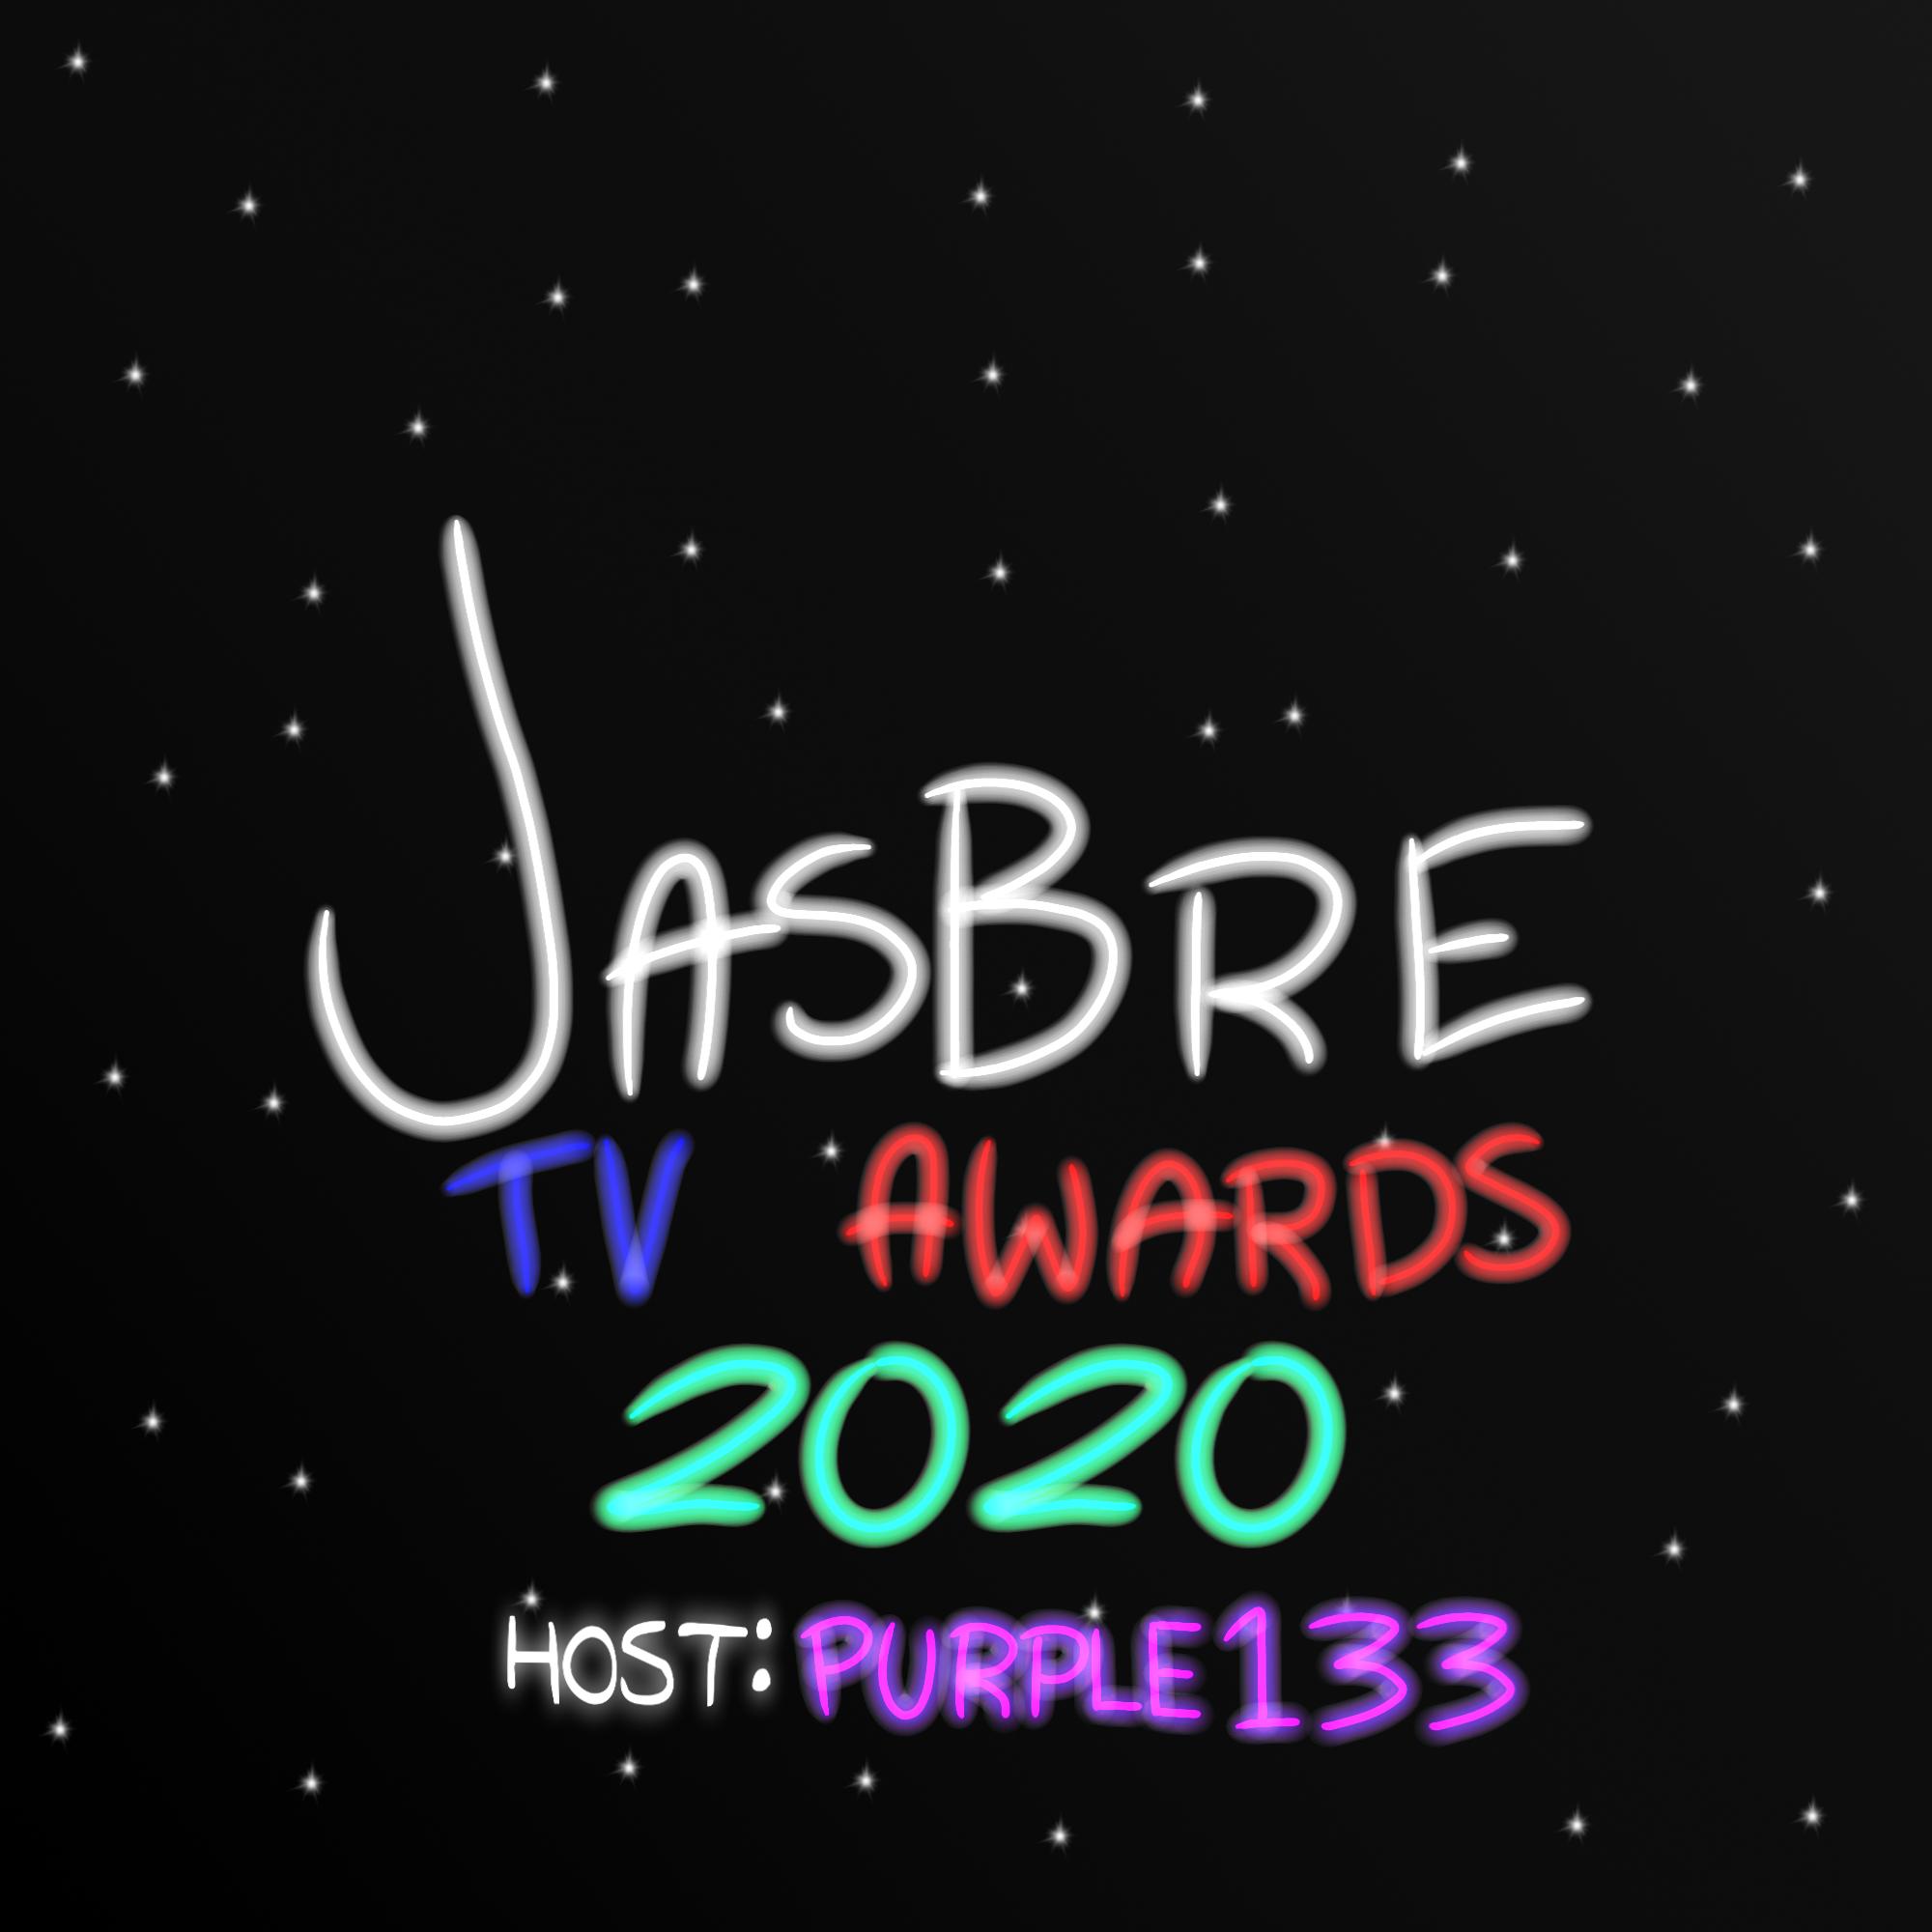 4th Jasbre Awards